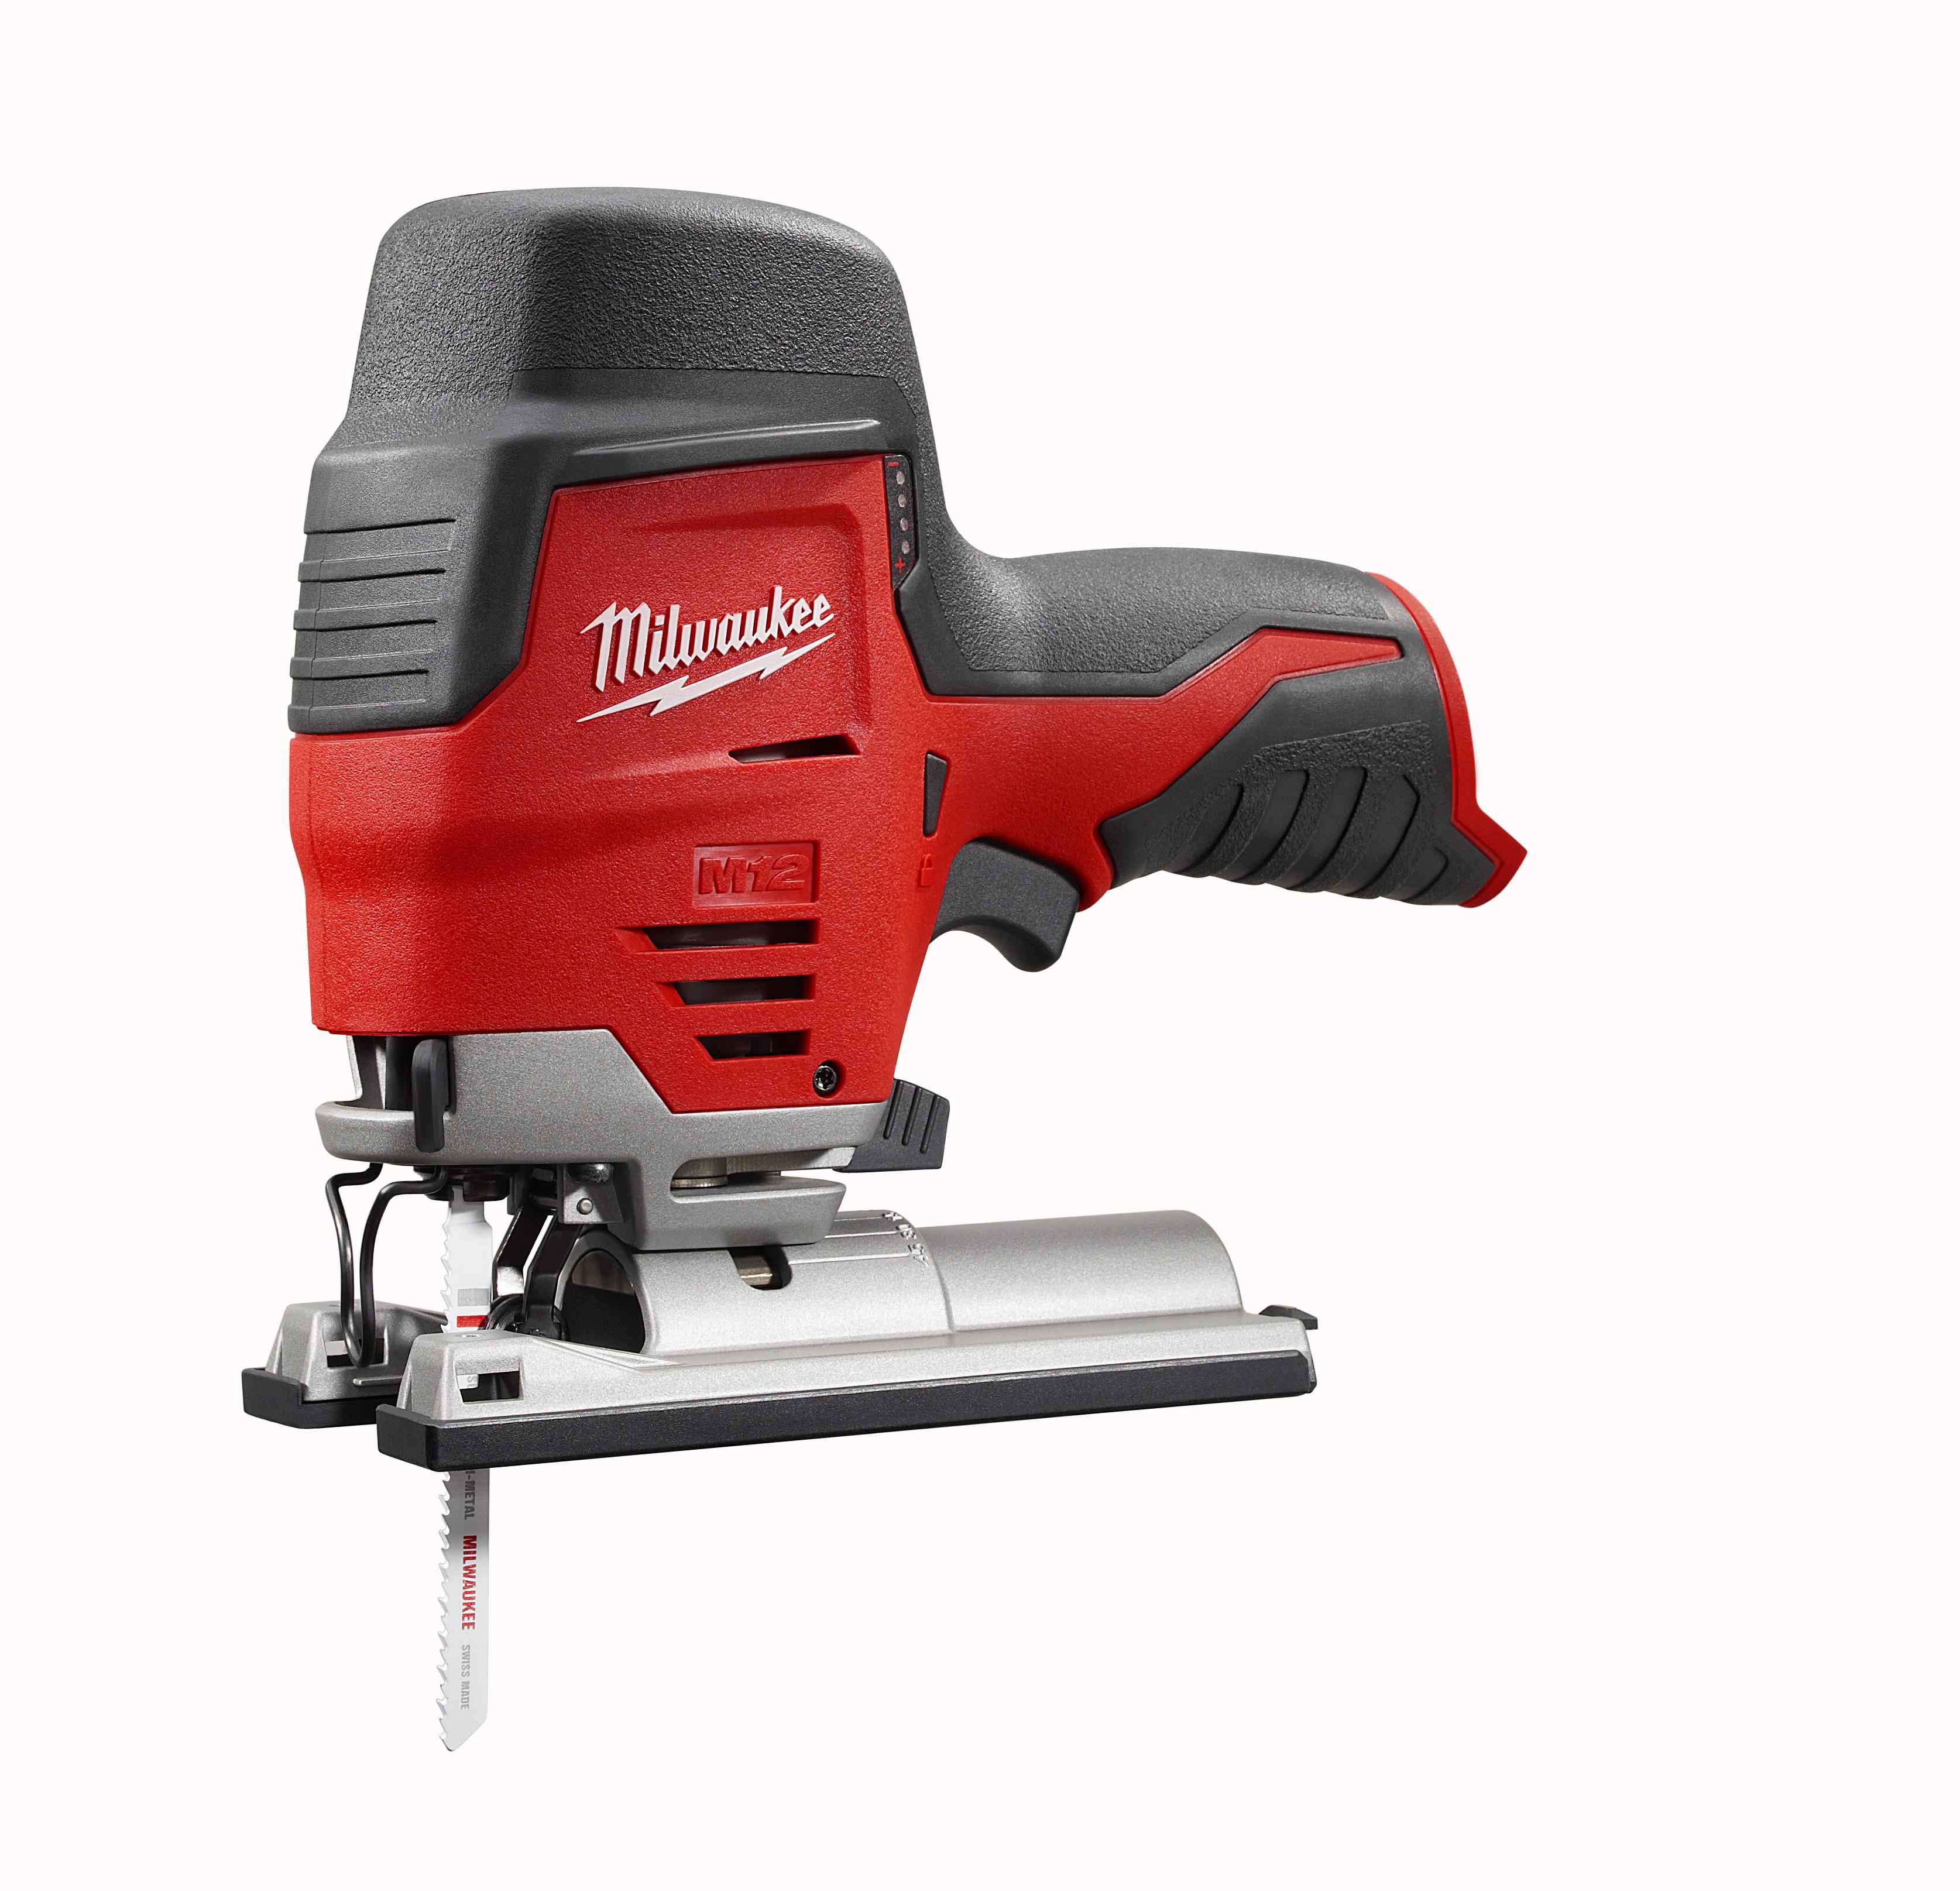 Milwaukee 2445-20 M12™ Cordless High Performance Jig Saw - Bare Tool